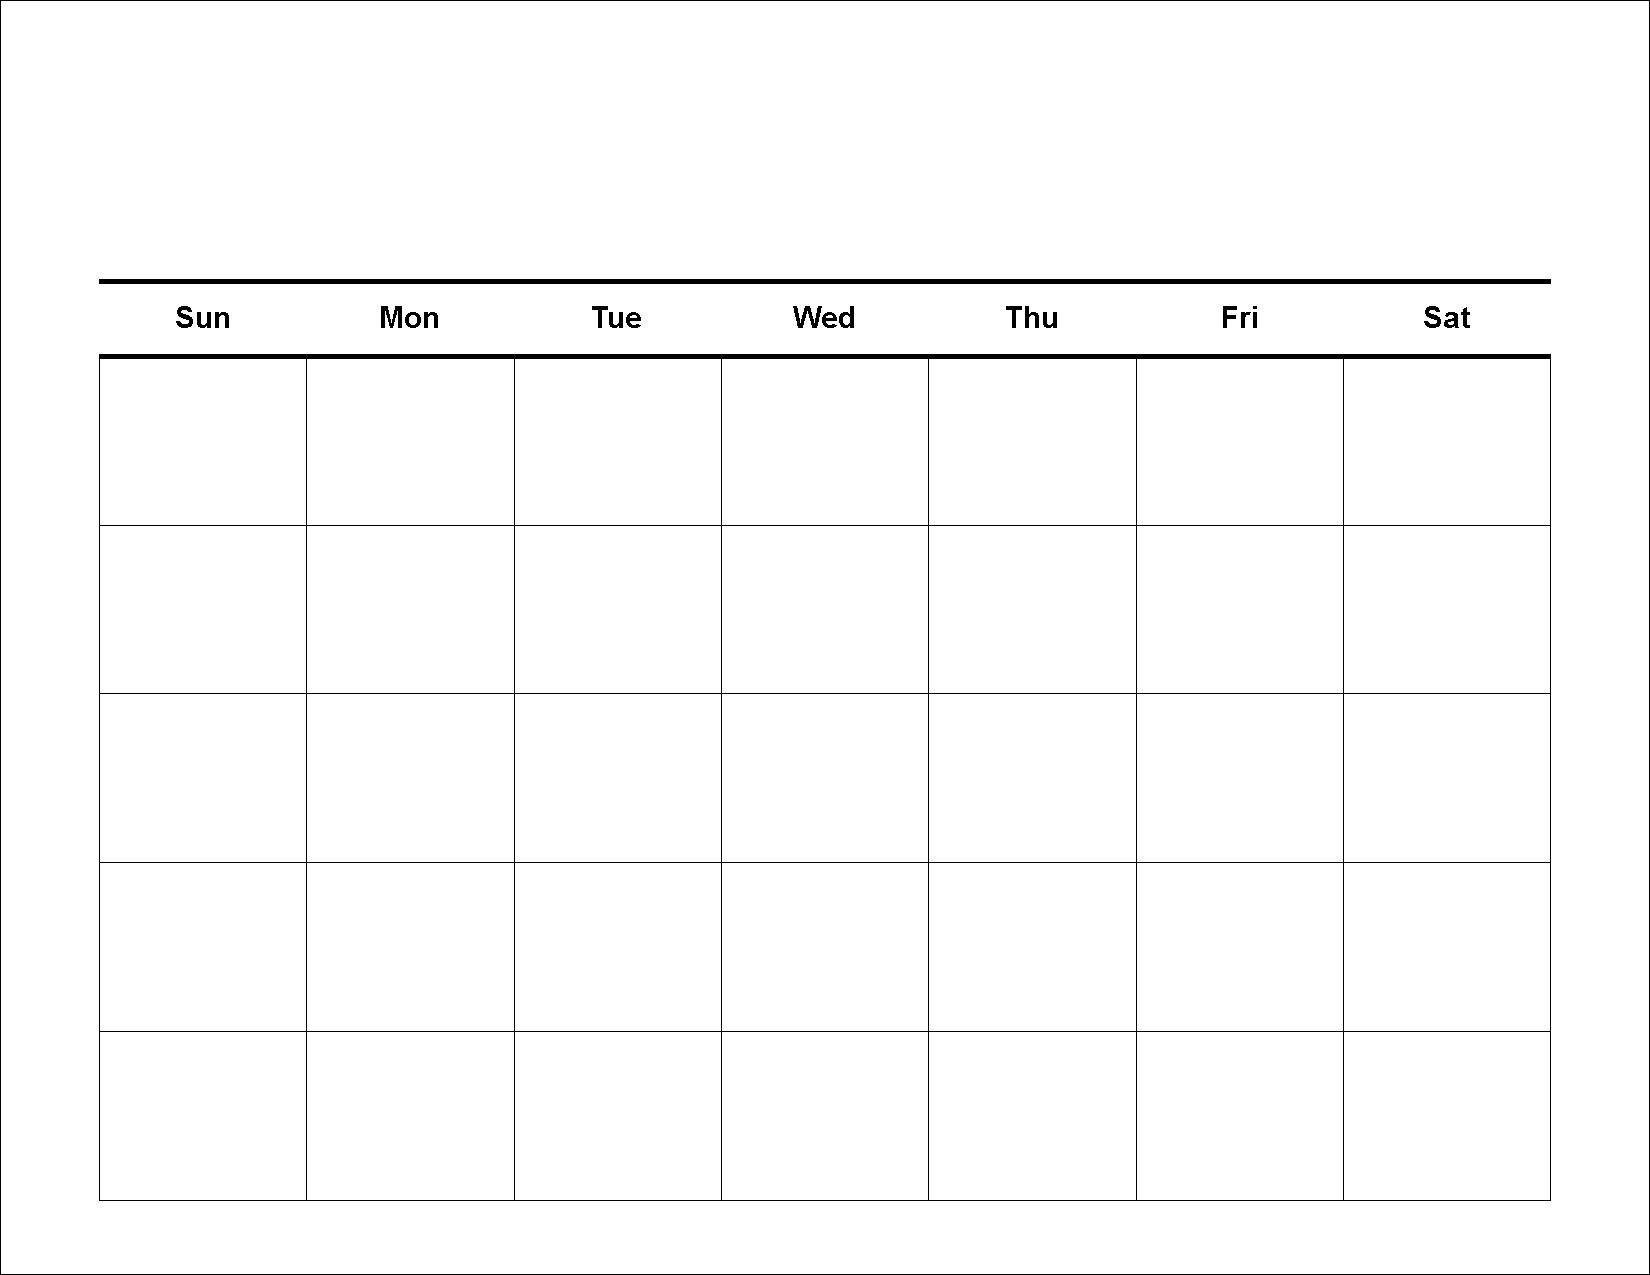 Calendar Template Large Boxes In 2020 | Free Blank Calendar